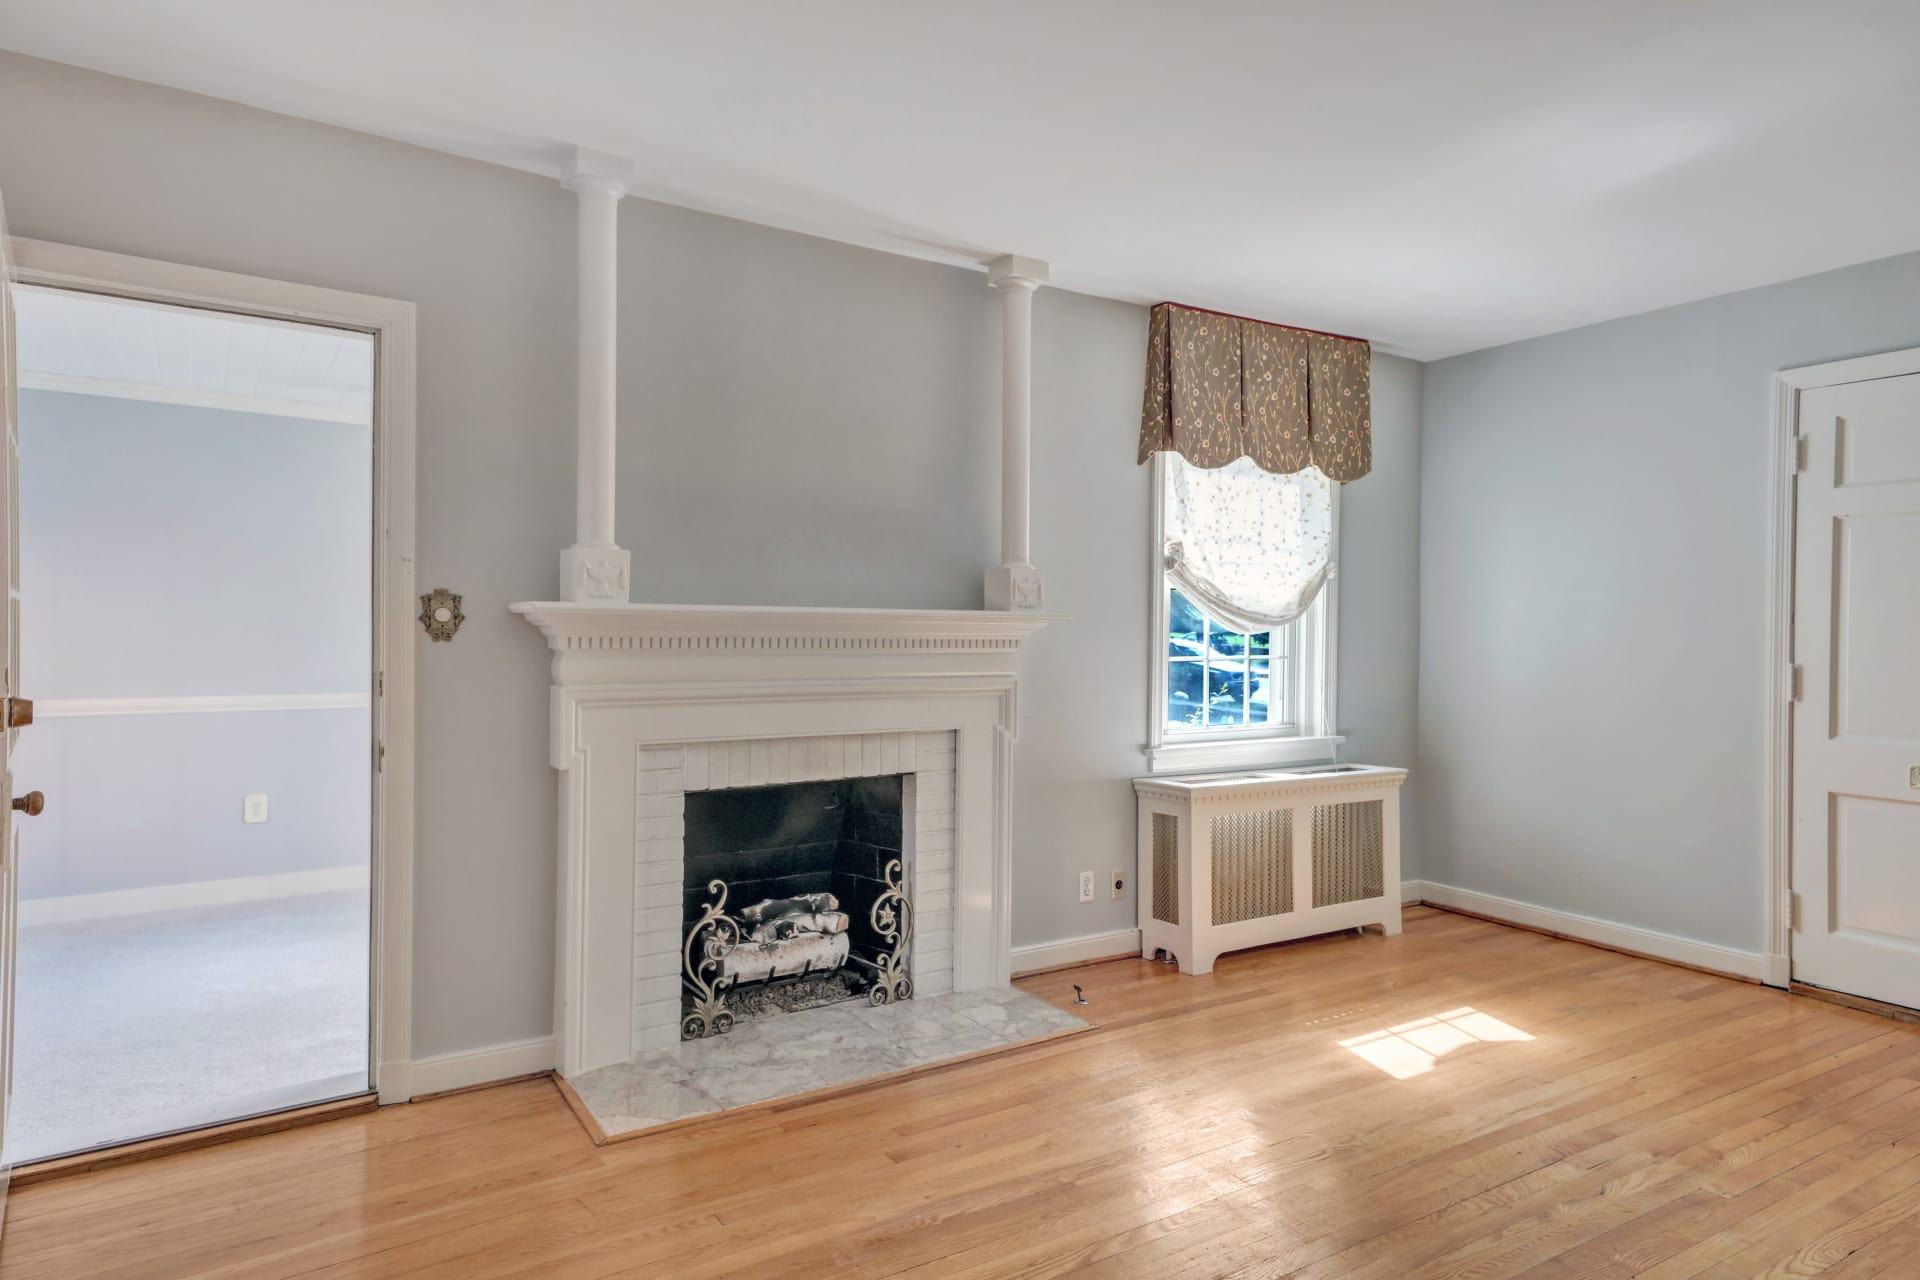 best deal hardwood floor molding of 4304 grove ave richmond virginia 23221 jamie younger virginia with regard to property details